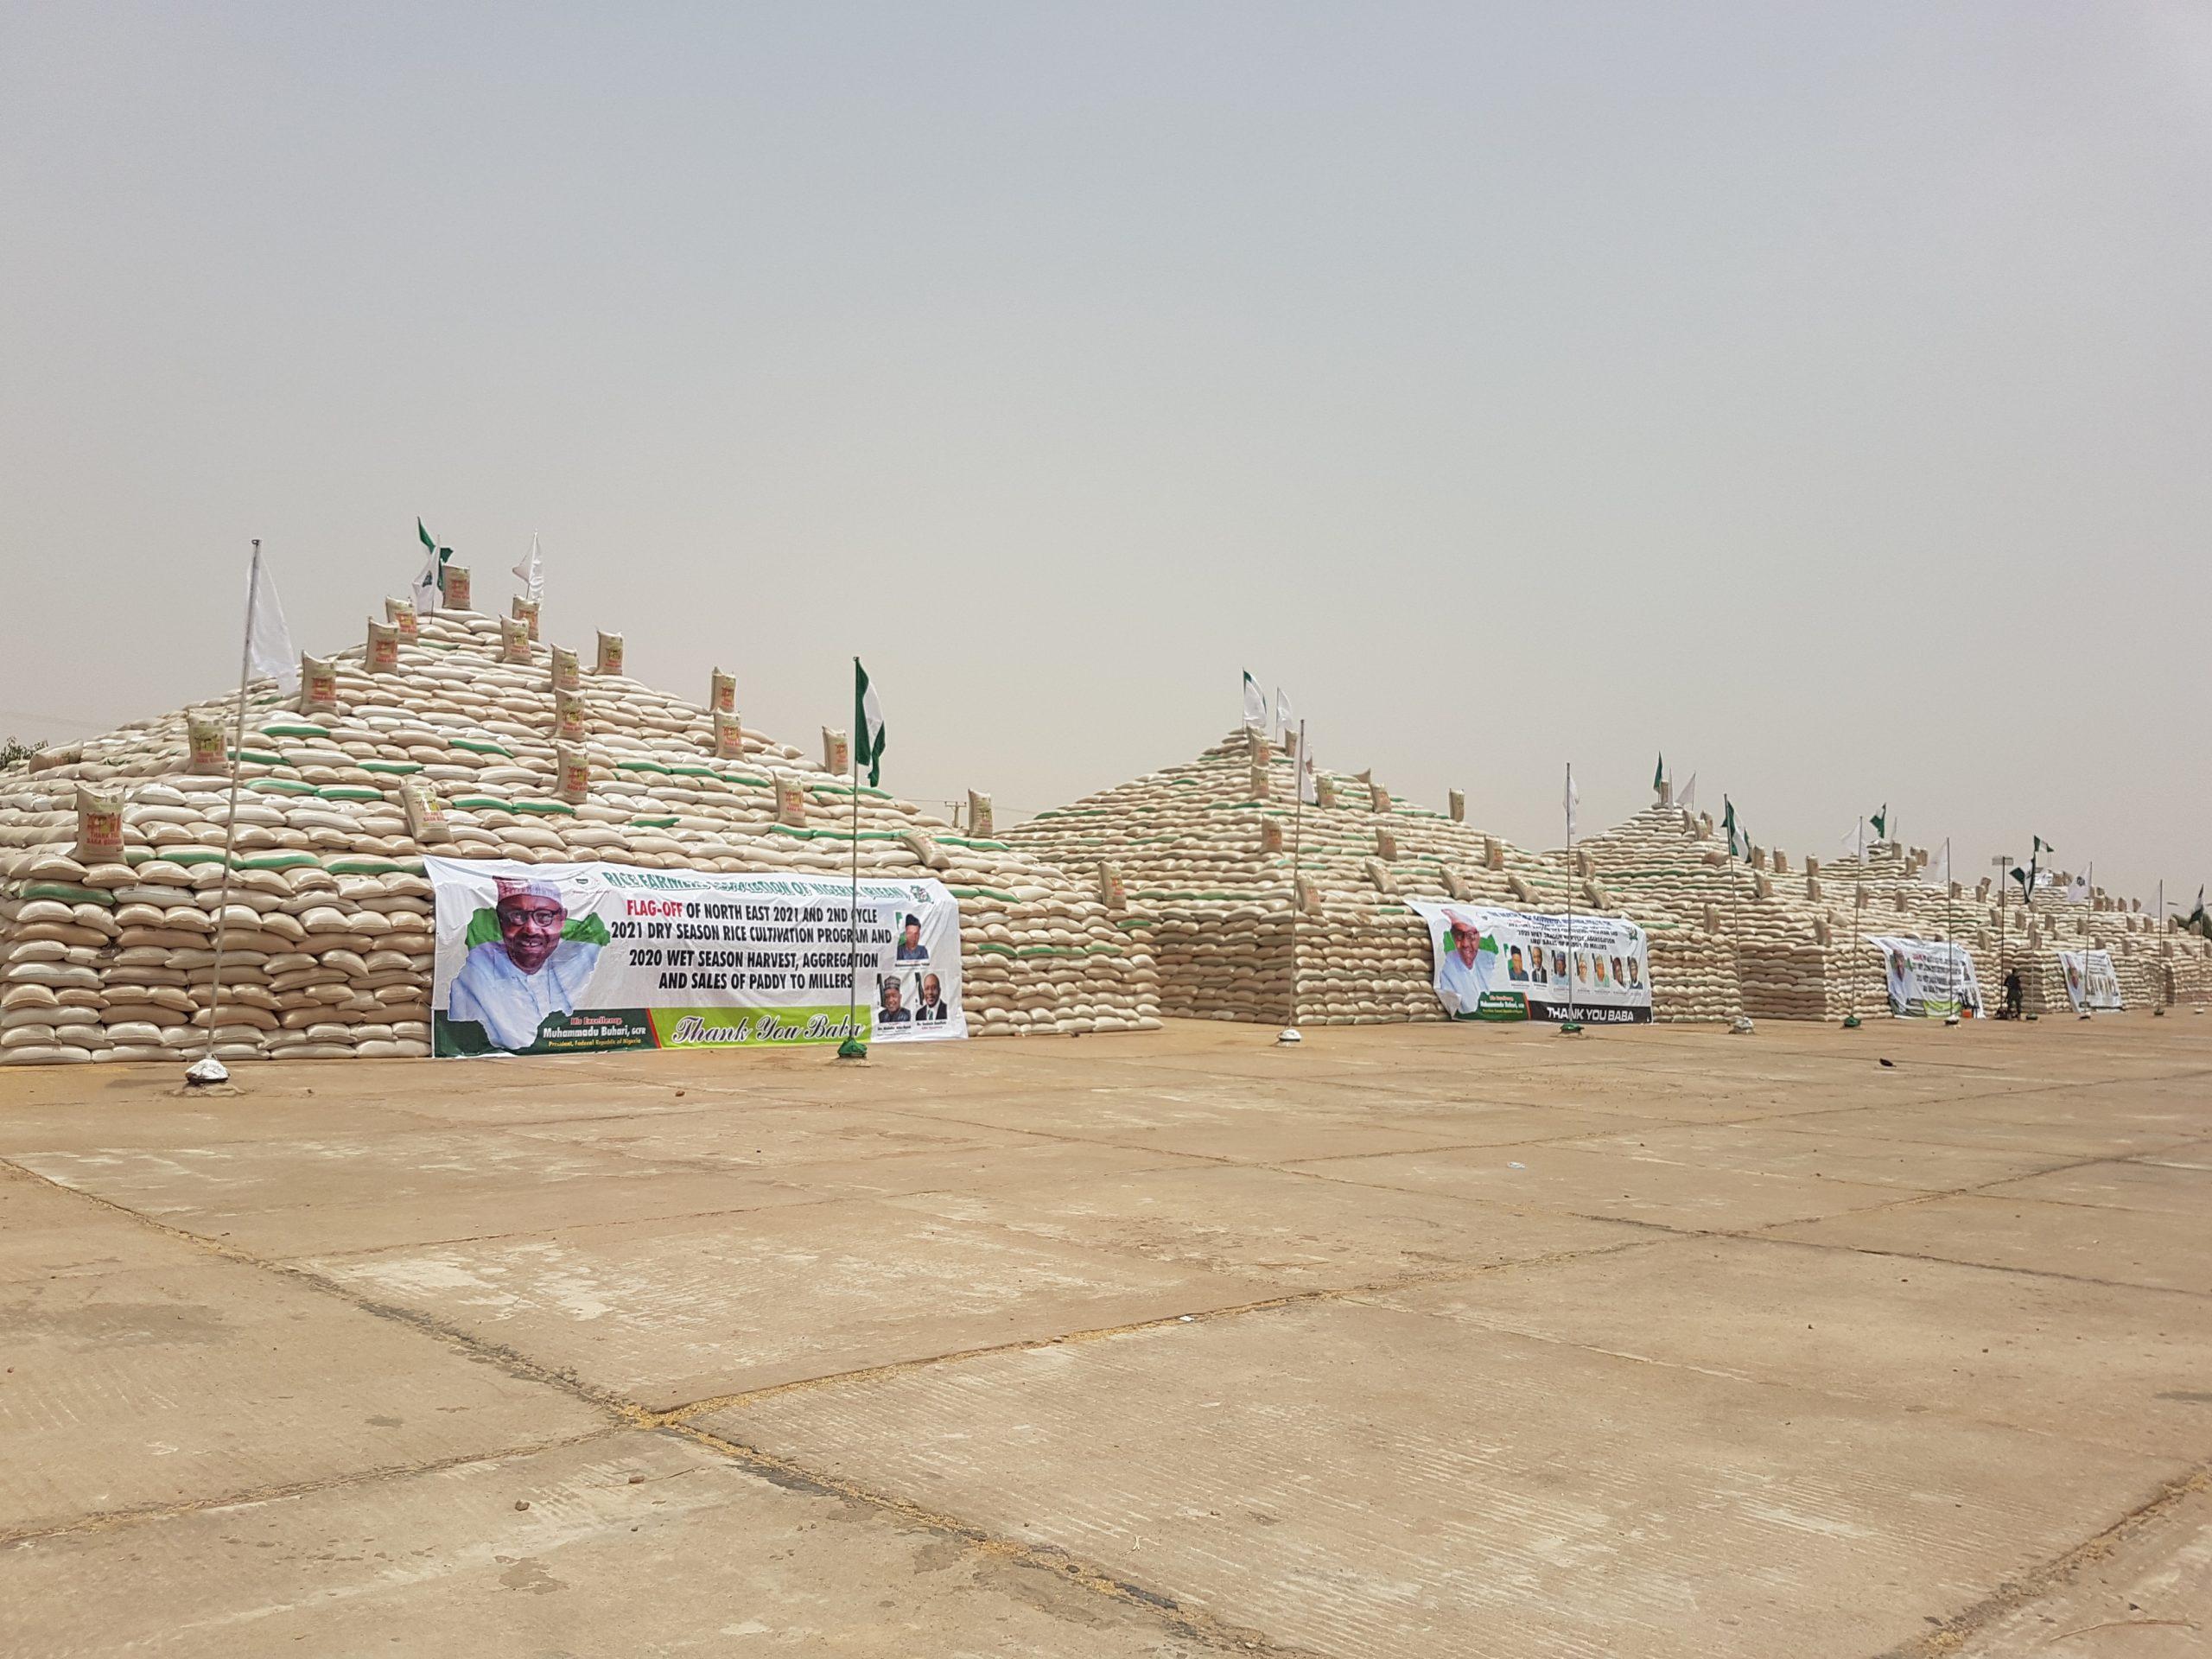 North East Rice Festival: Buhari assures Nigerians of more pyramids